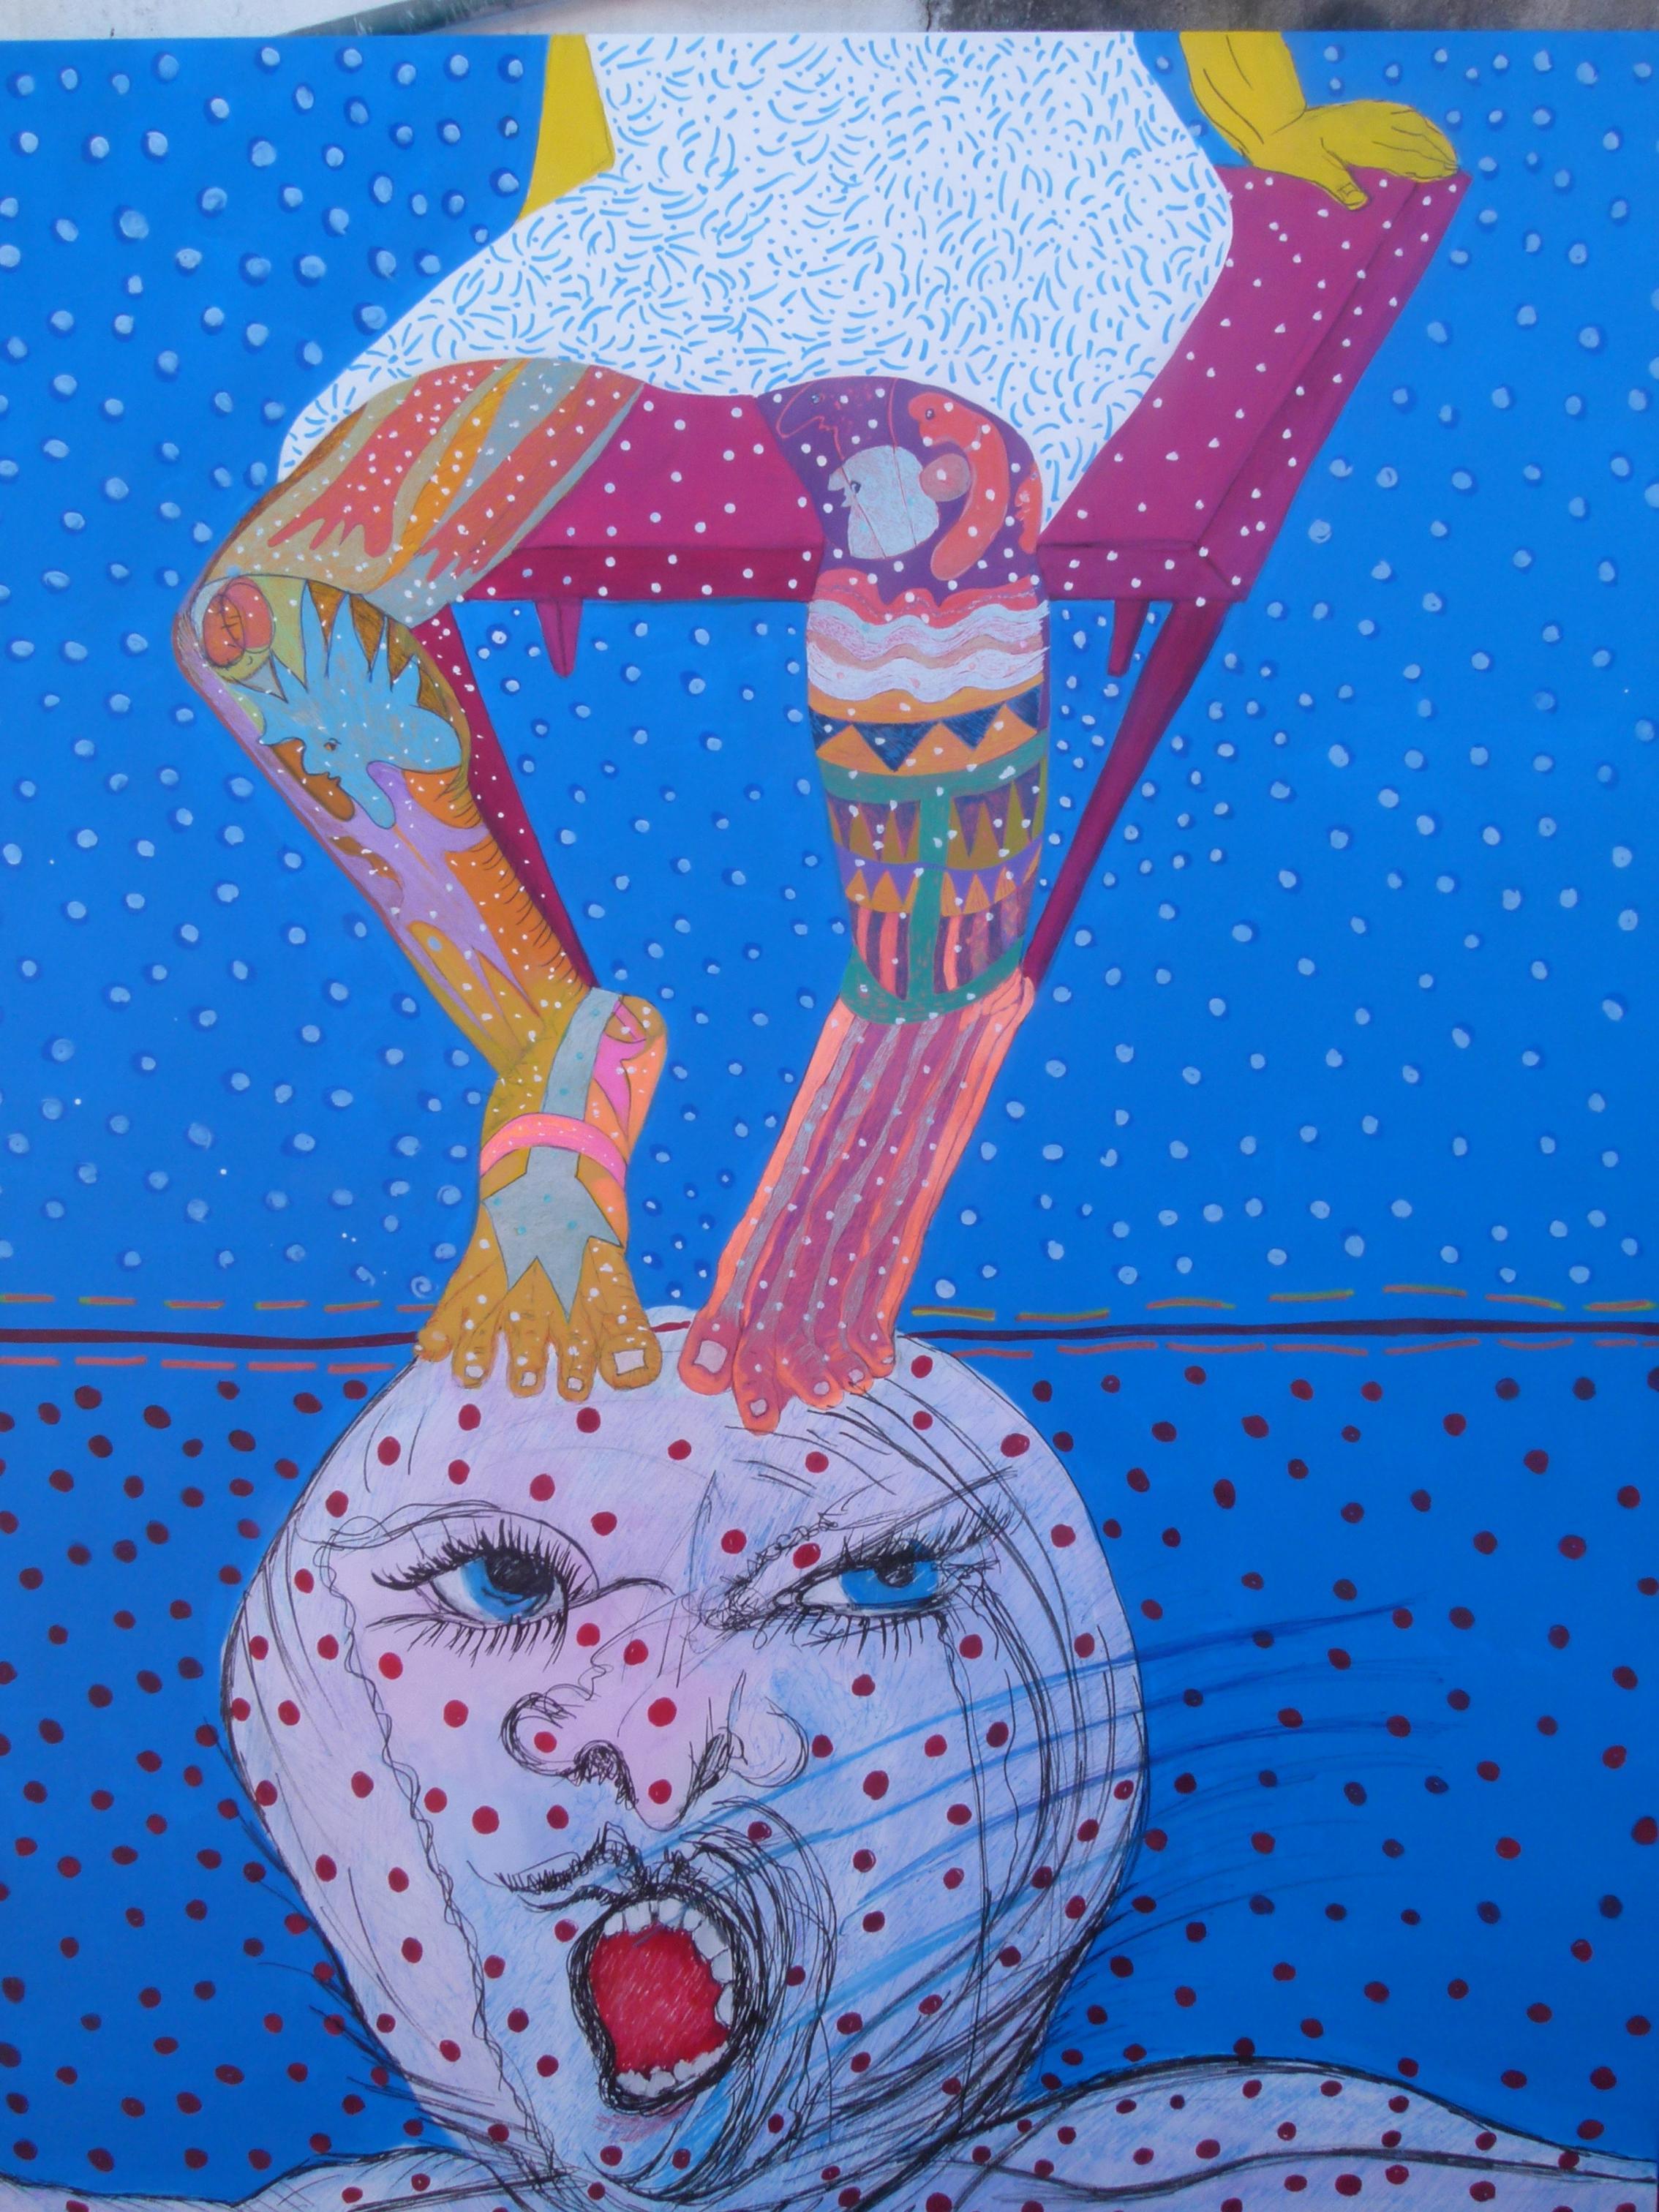 pensamientos pisoteados (2015) - Cristina Minacori